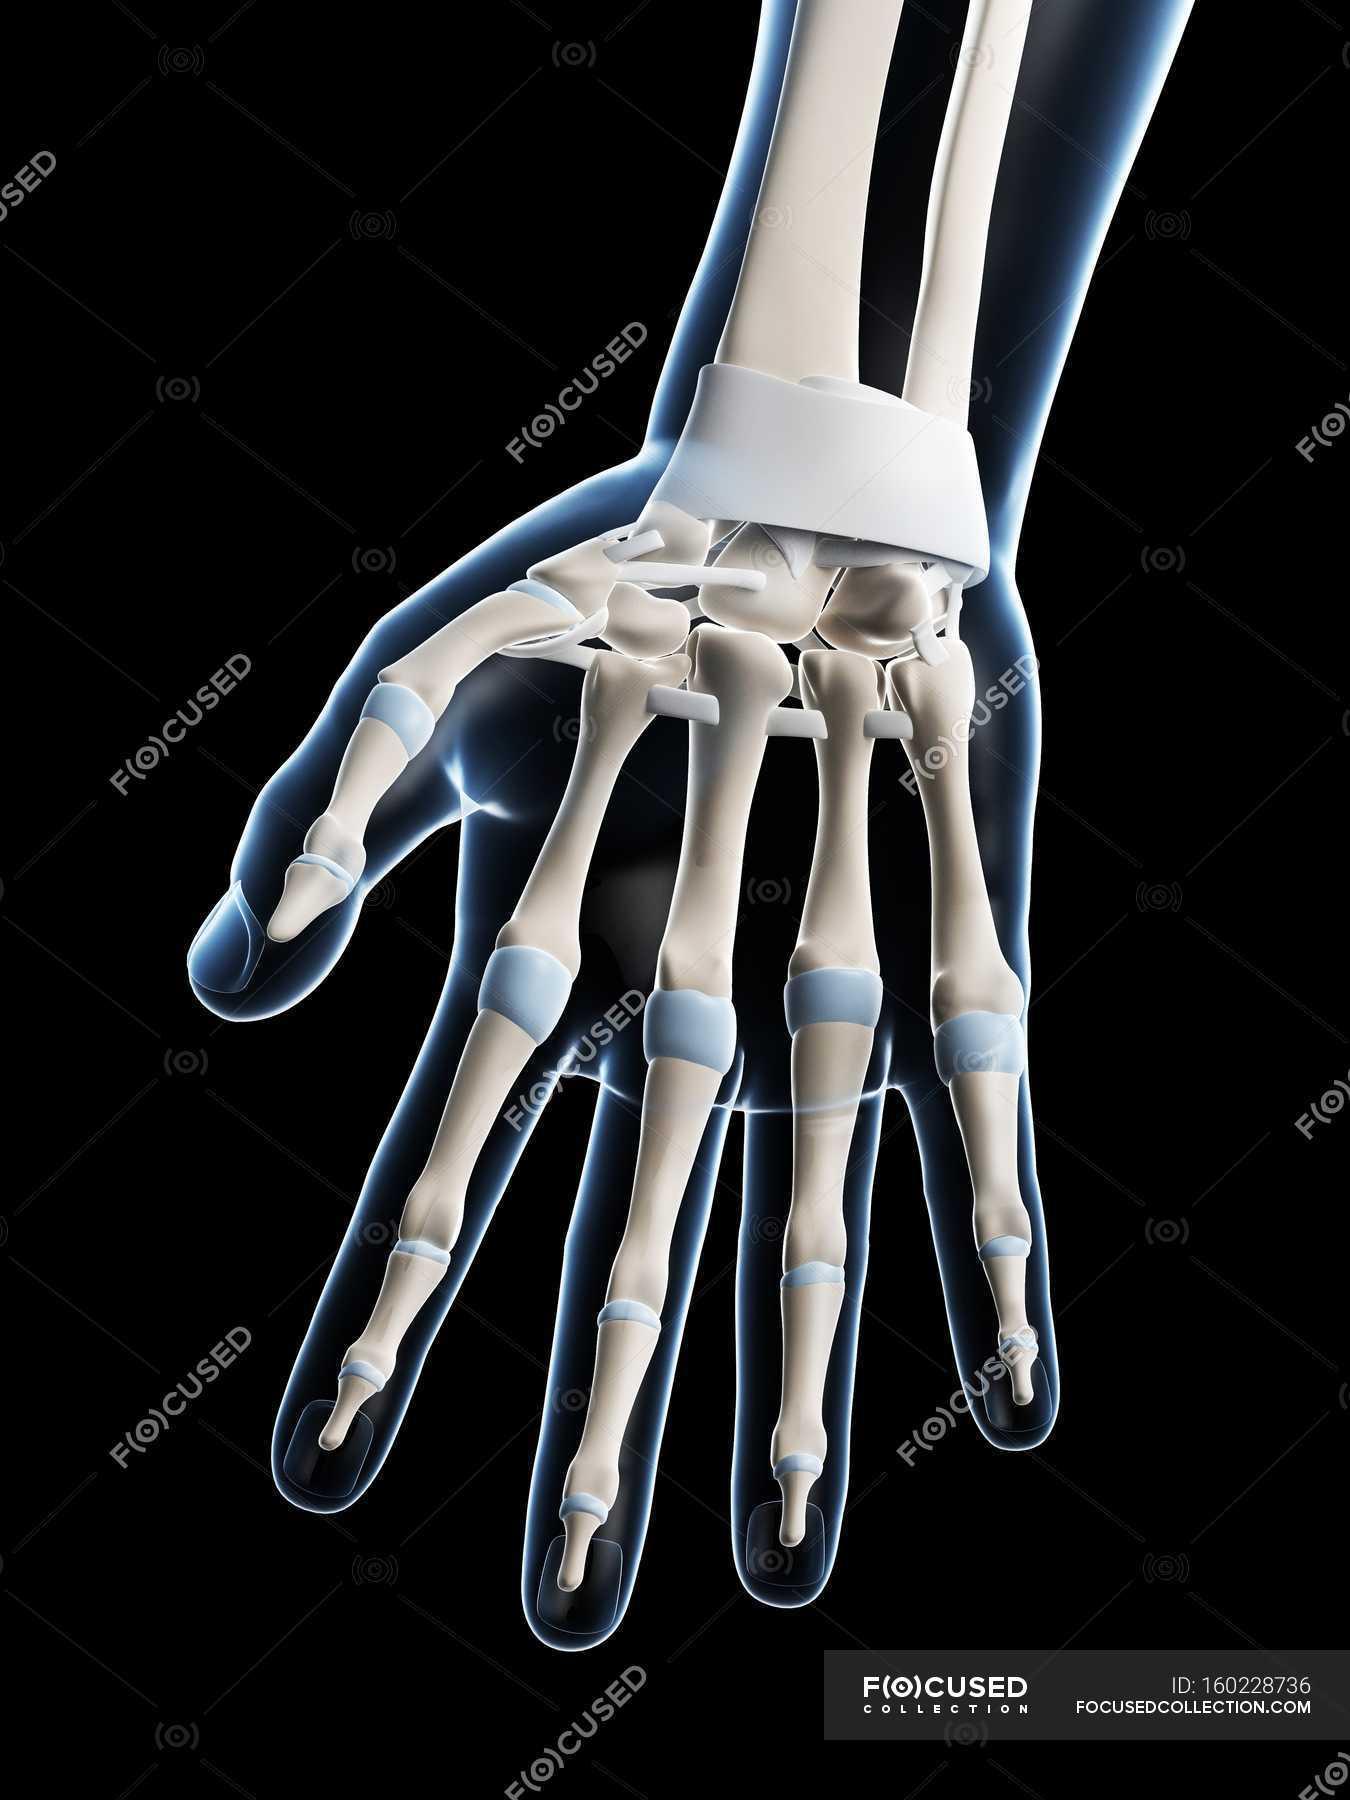 Human hand bones anatomy — Stock Photo | #160228736